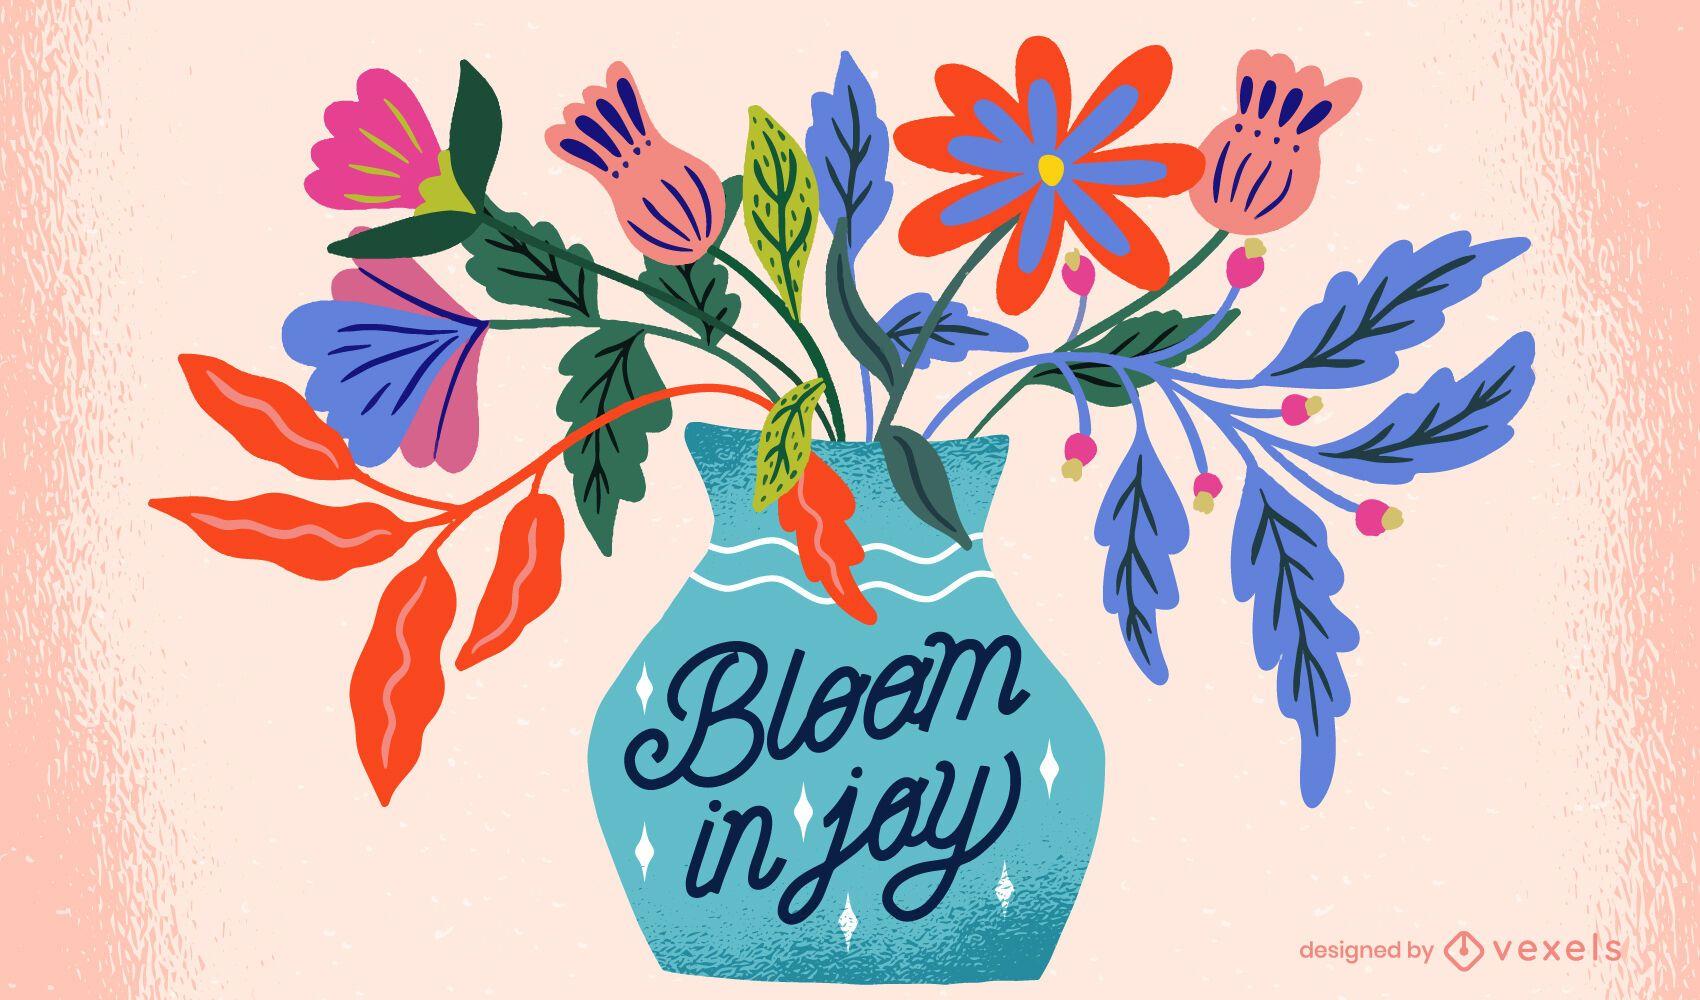 Textured flower vase illustration